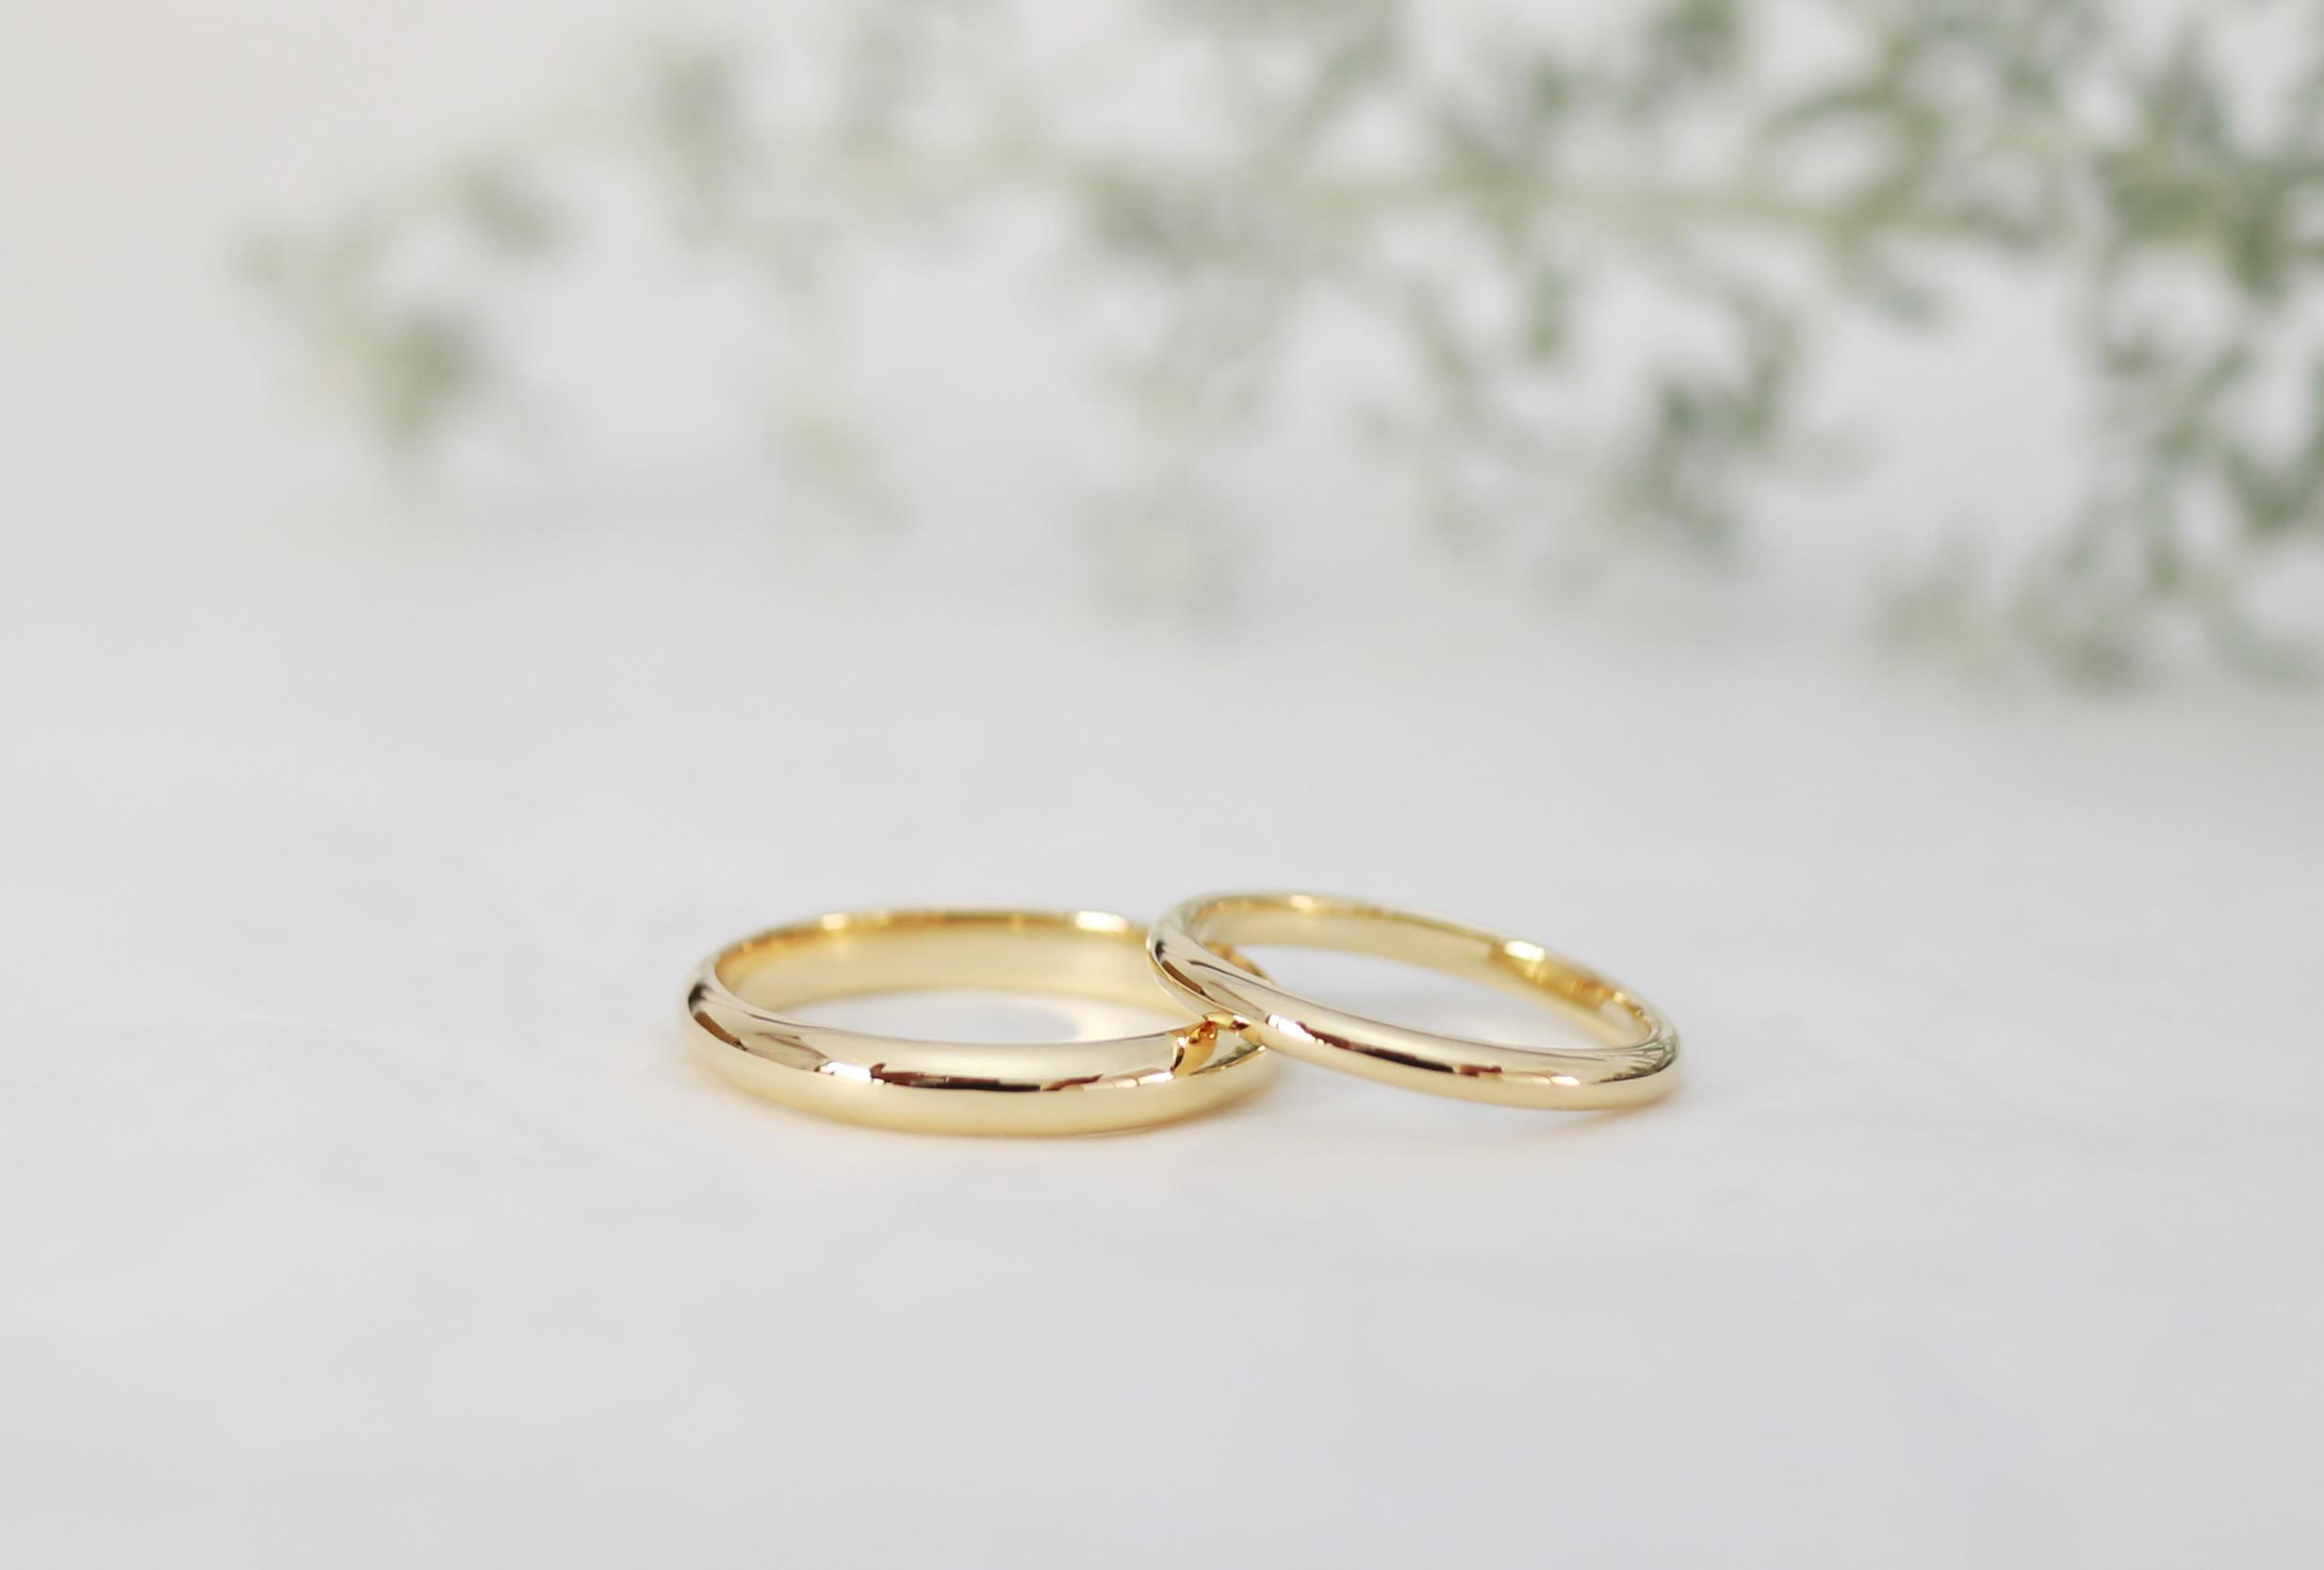 K18イエローゴールドのふたりで手作りした結婚指輪